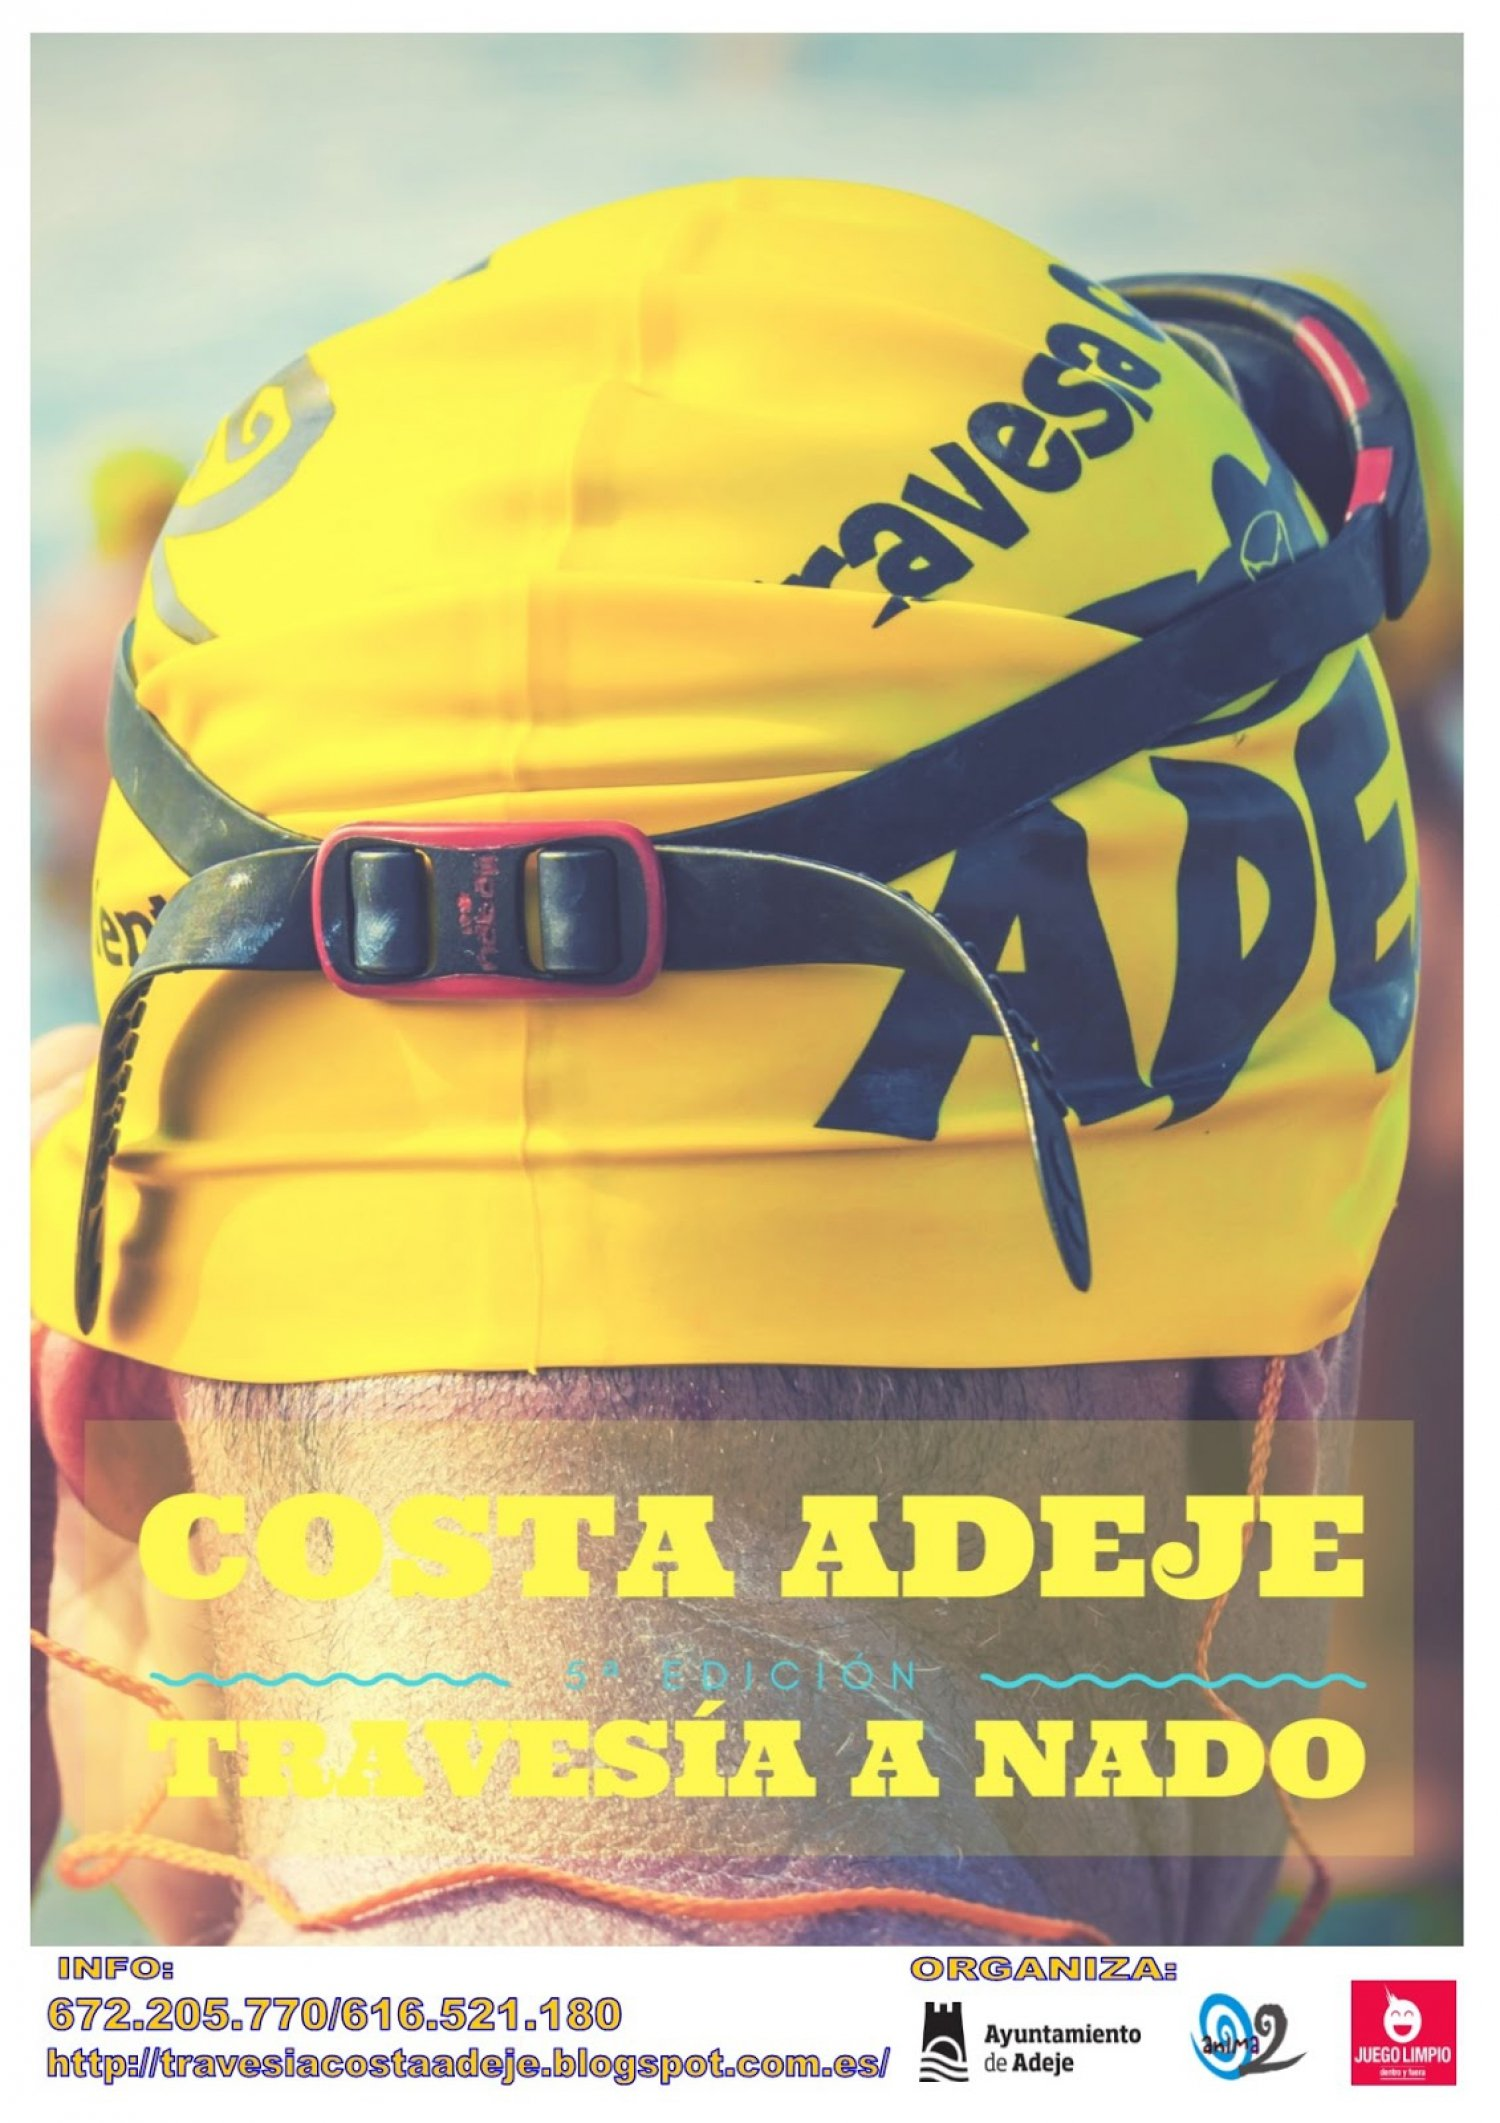 Annual Costa Adeje Swim